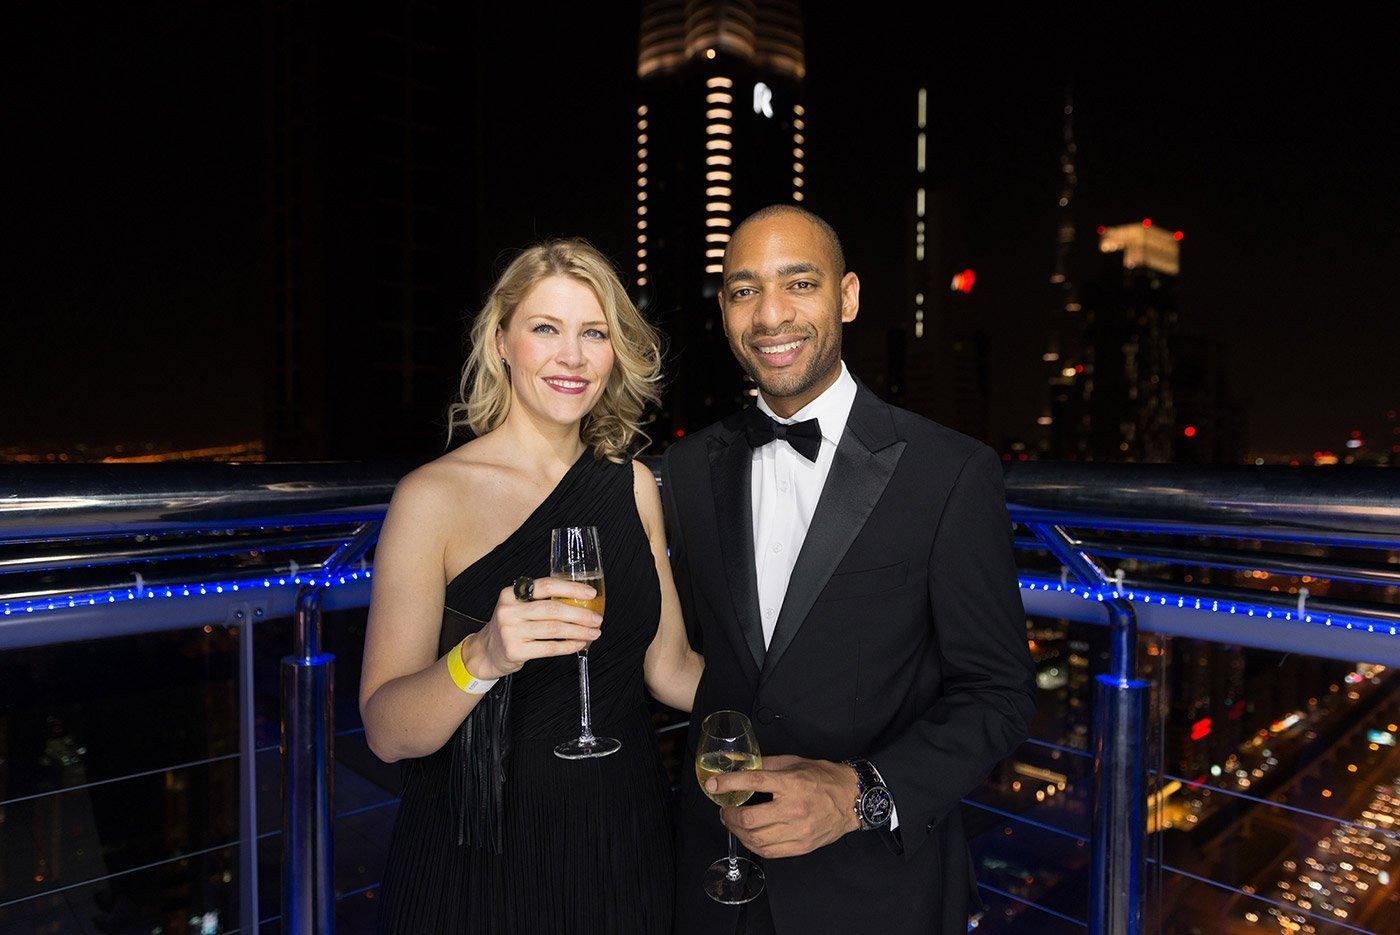 Private Party Photography Dubai